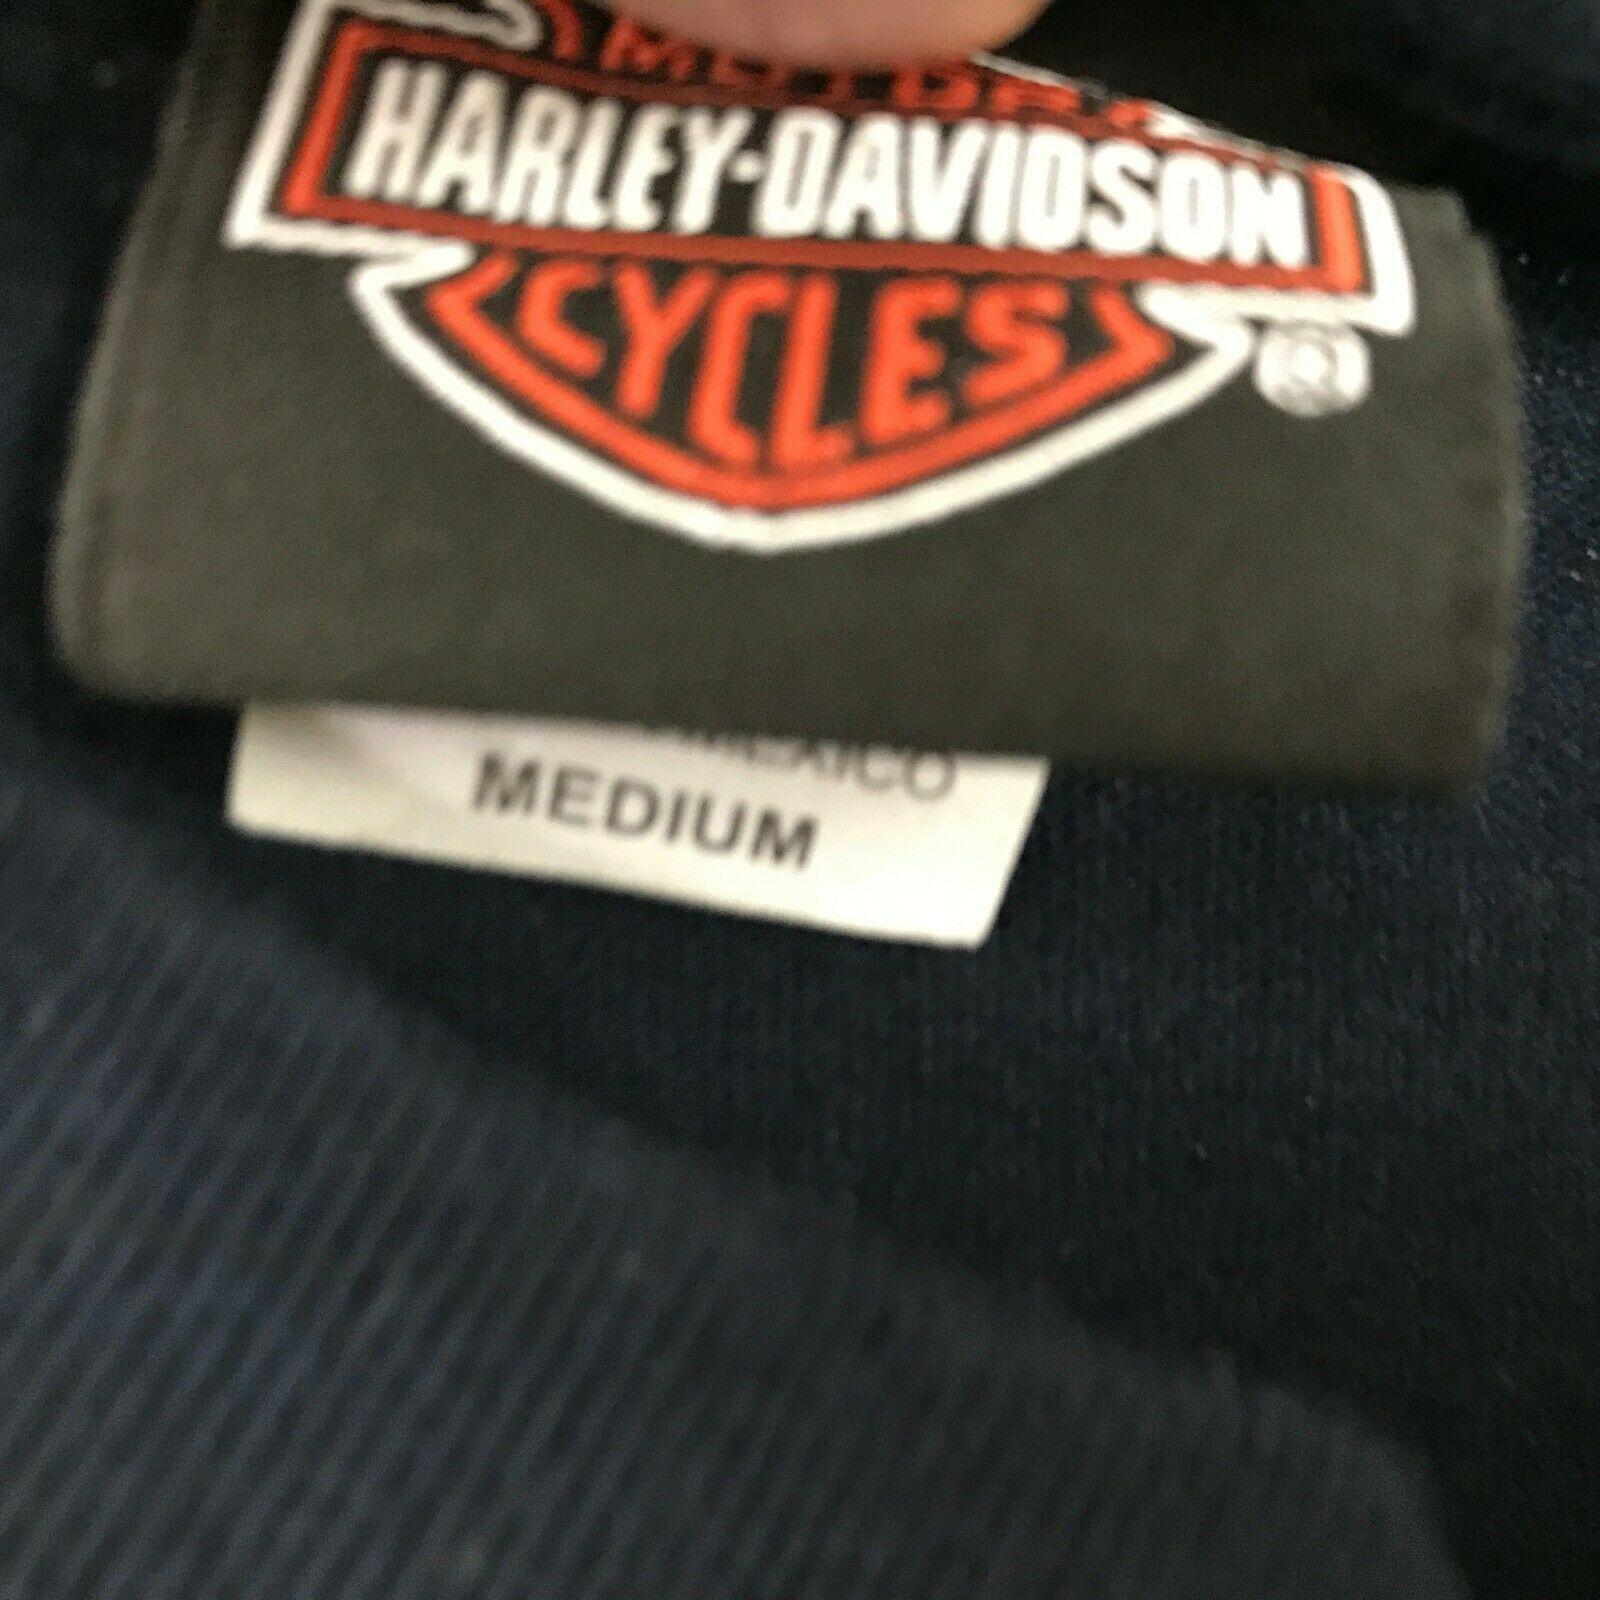 Harley Davidson Imagen Retro Camisa Dos Caras Azul Marino Motero Camiseta TALLA image 7